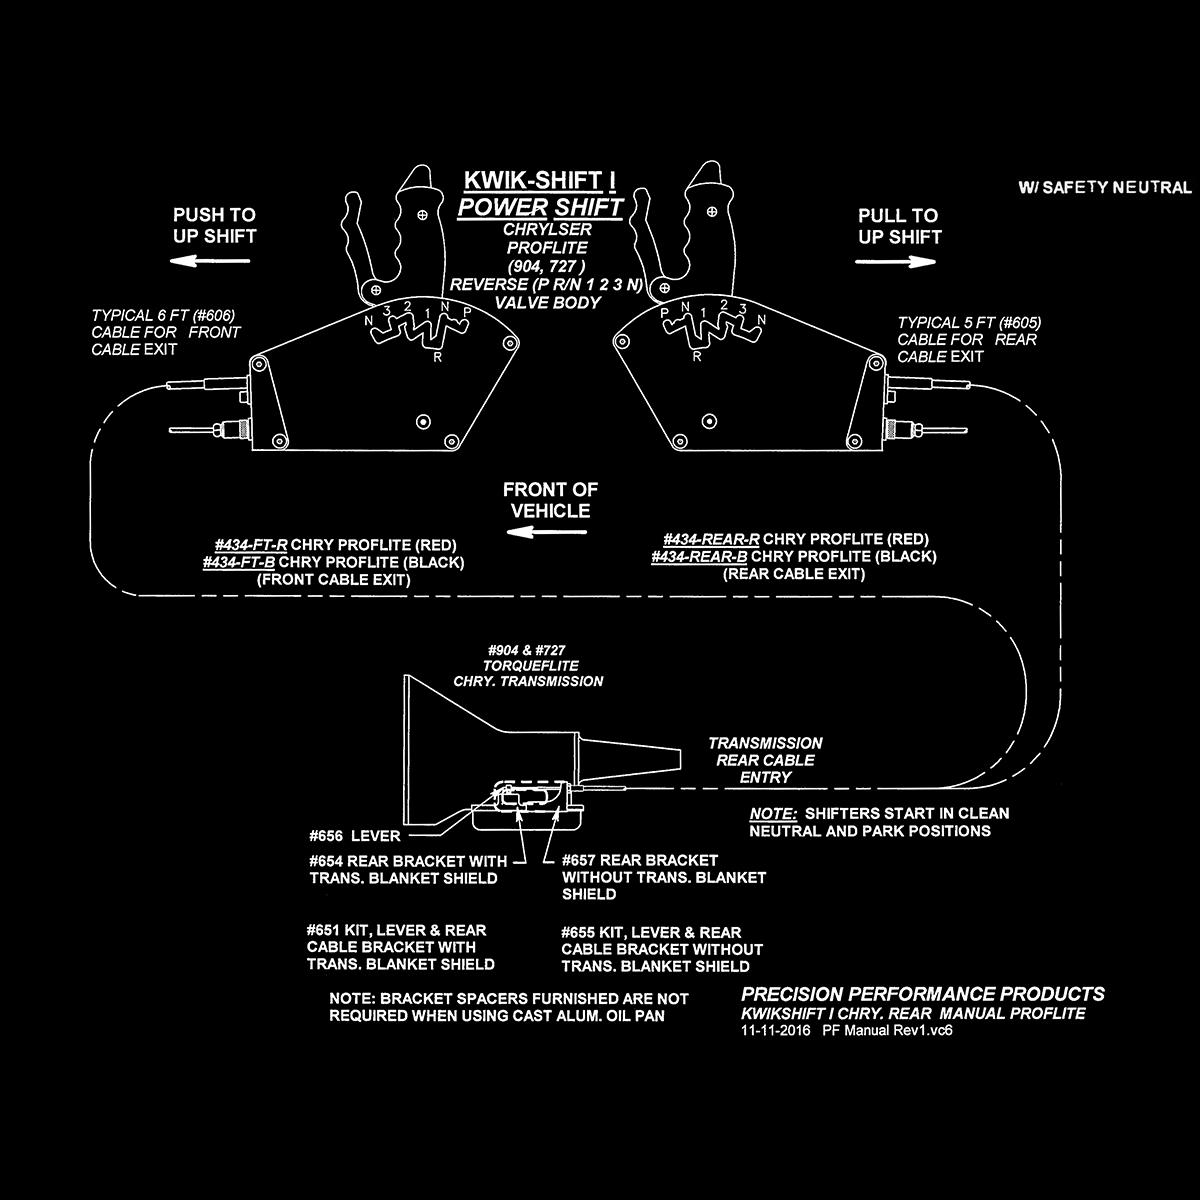 Yc 6770 727 Neutral Safety Switch Wiring Diagram Free Diagram